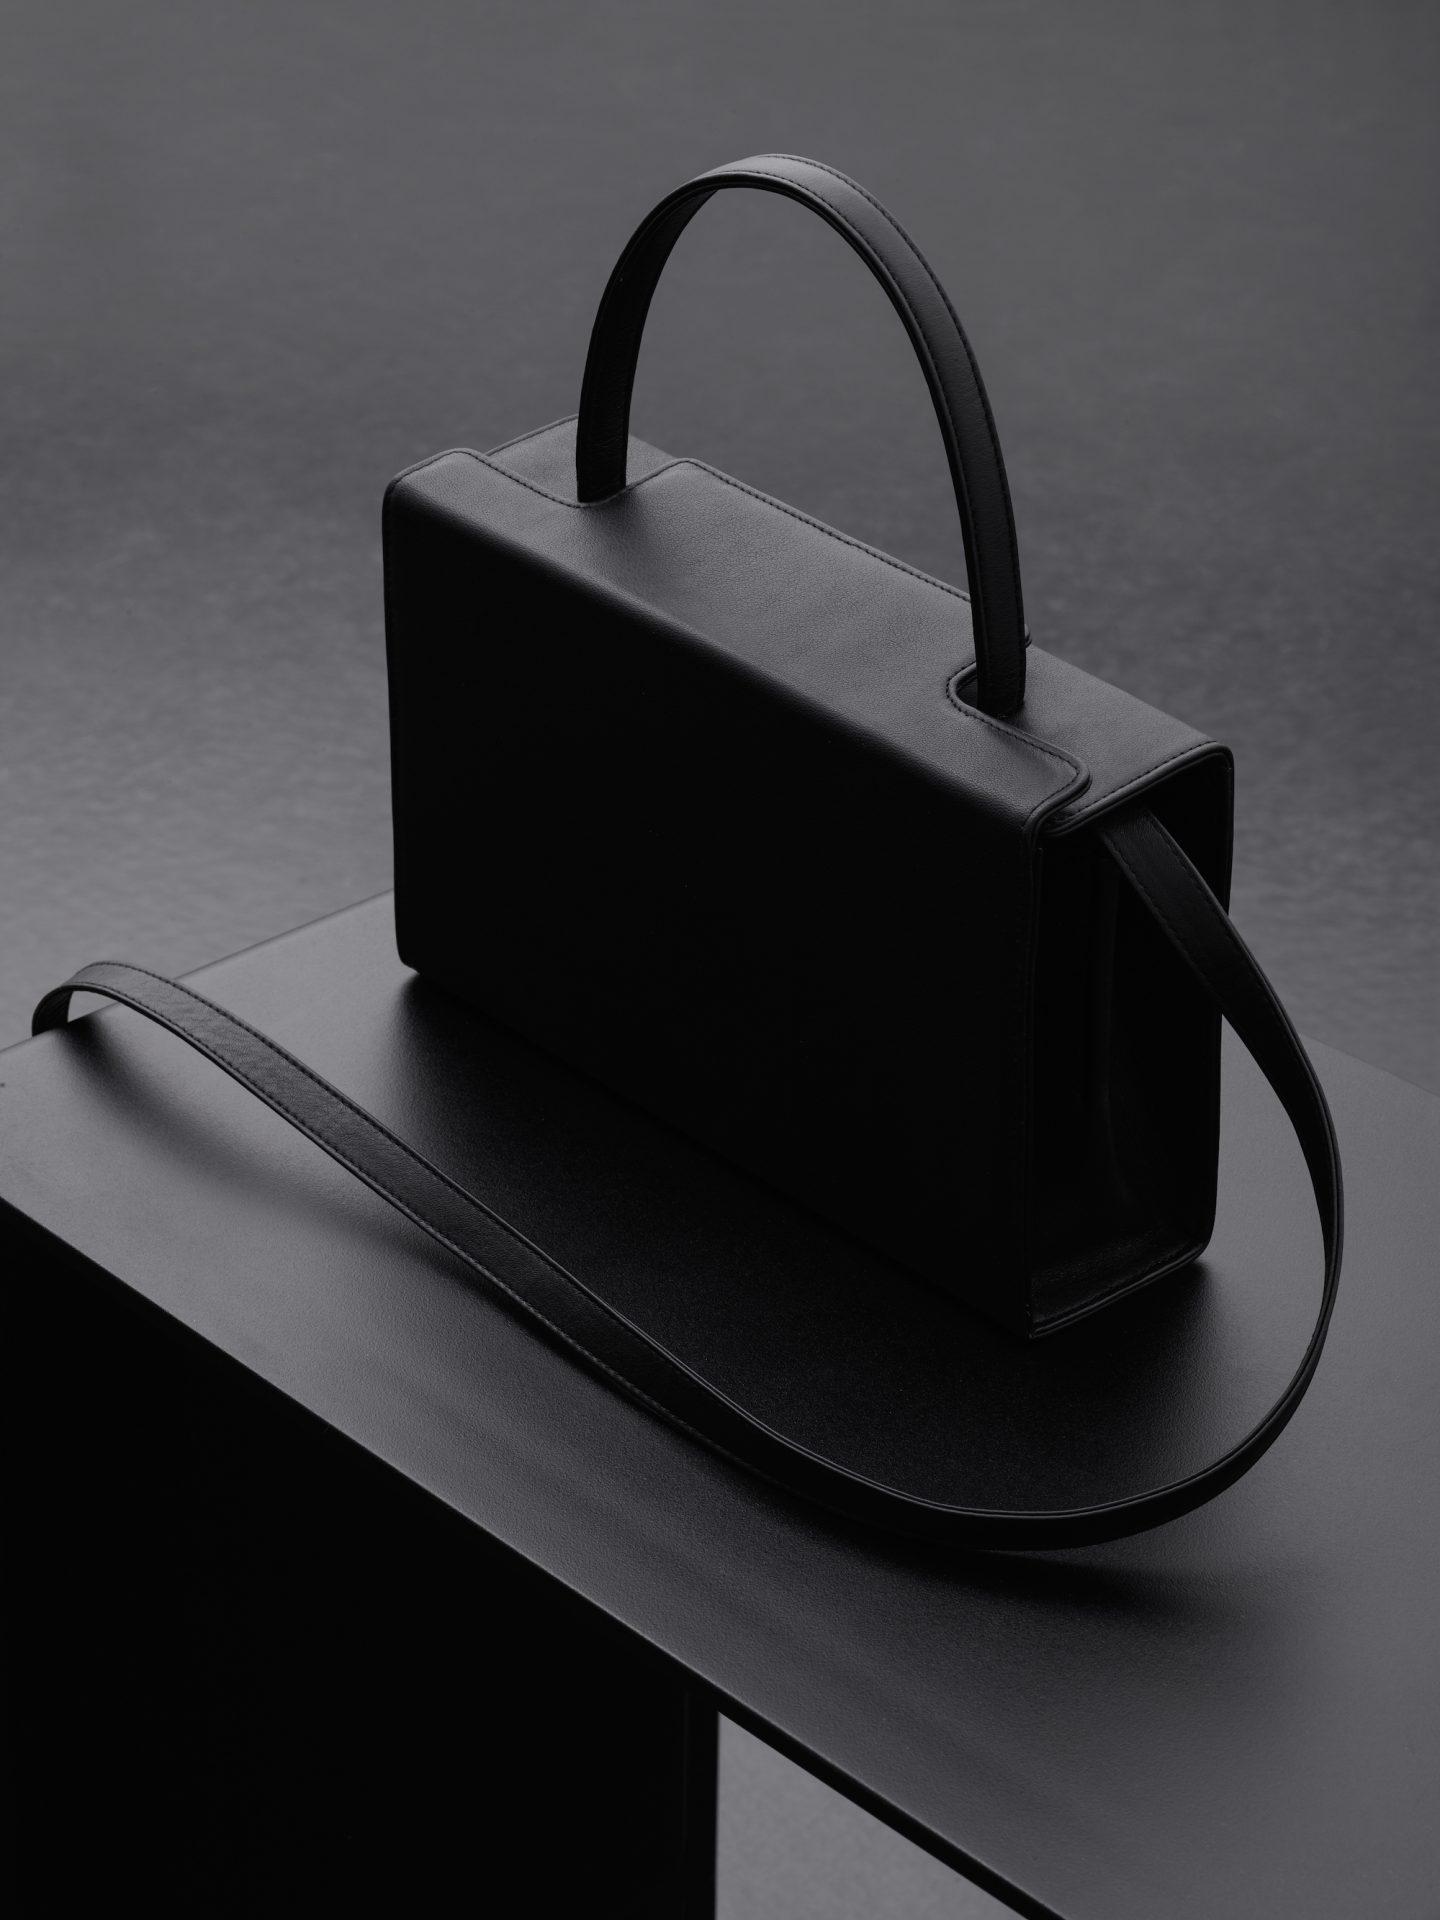 IGNANT-Design-Tsatsas-Dieter-Rams-931-005